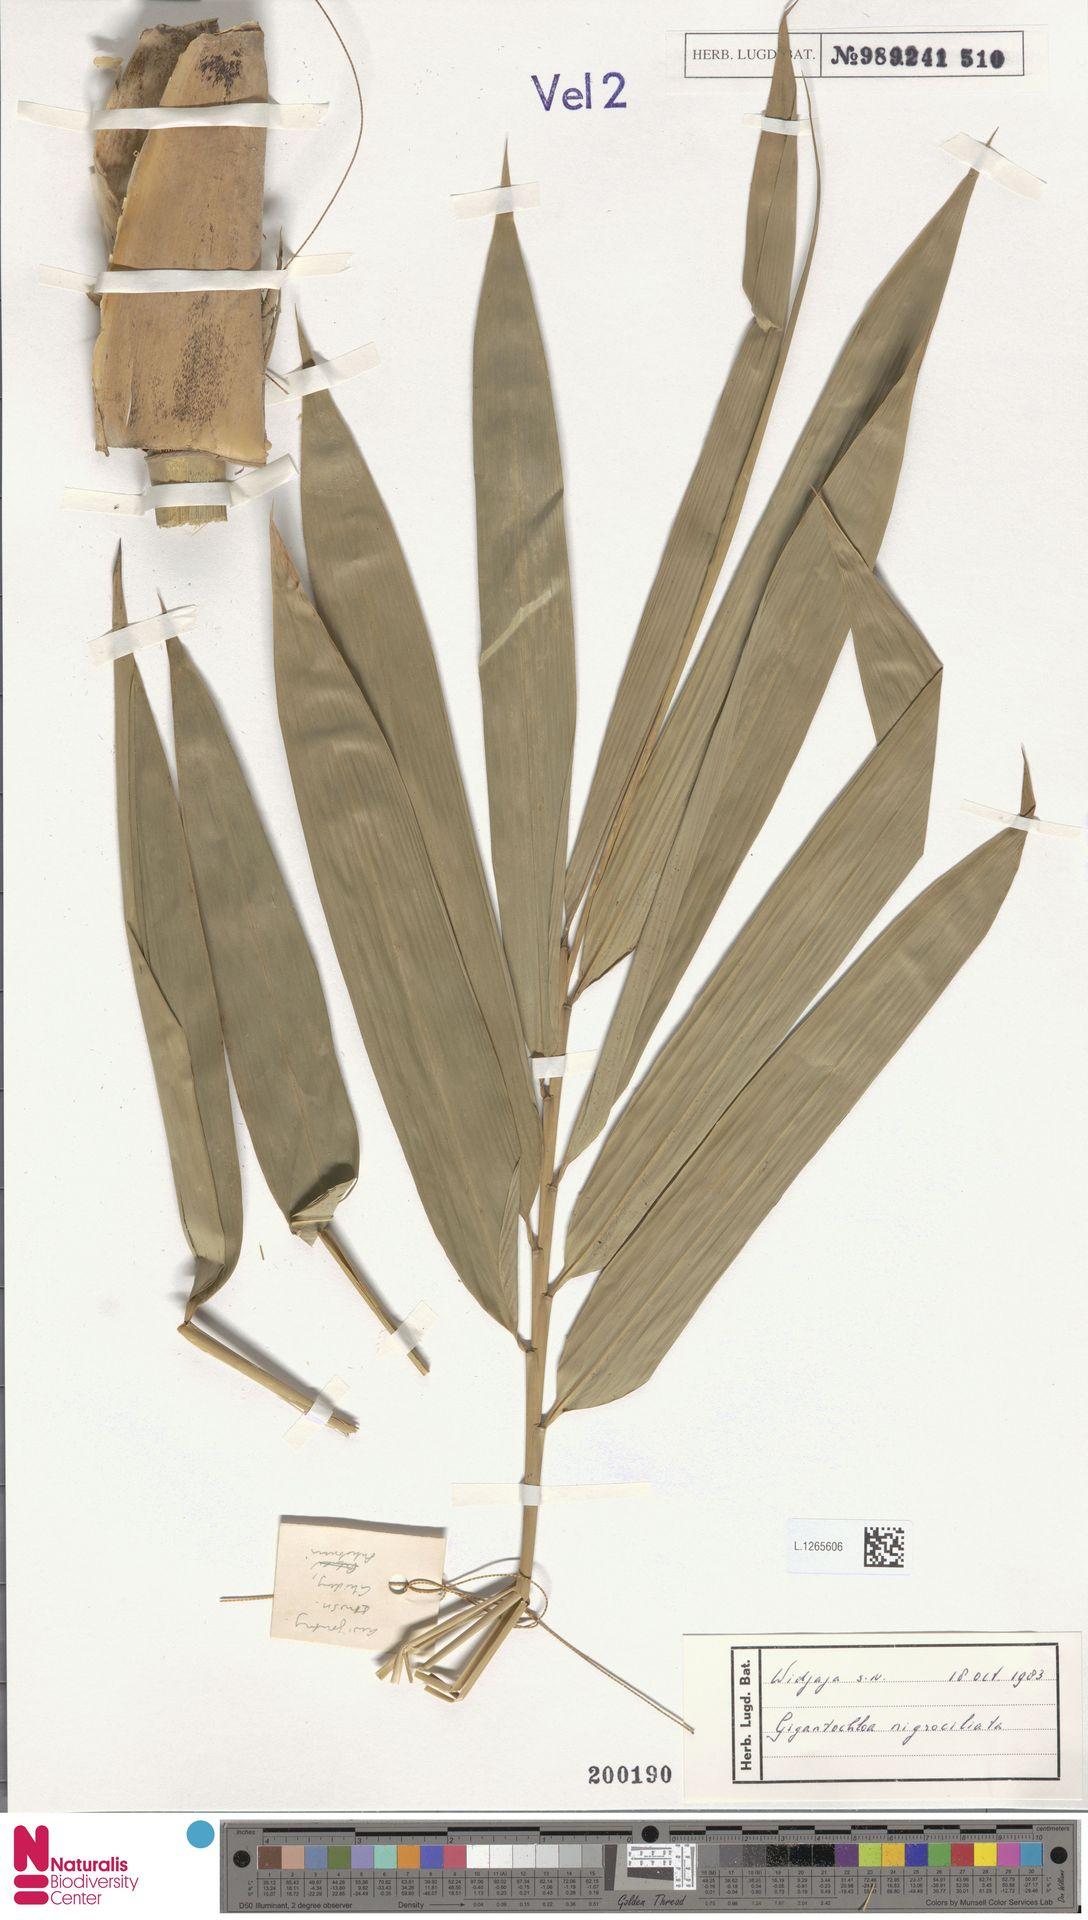 L.1265606 | Gigantochloa nigrociliata Kurz